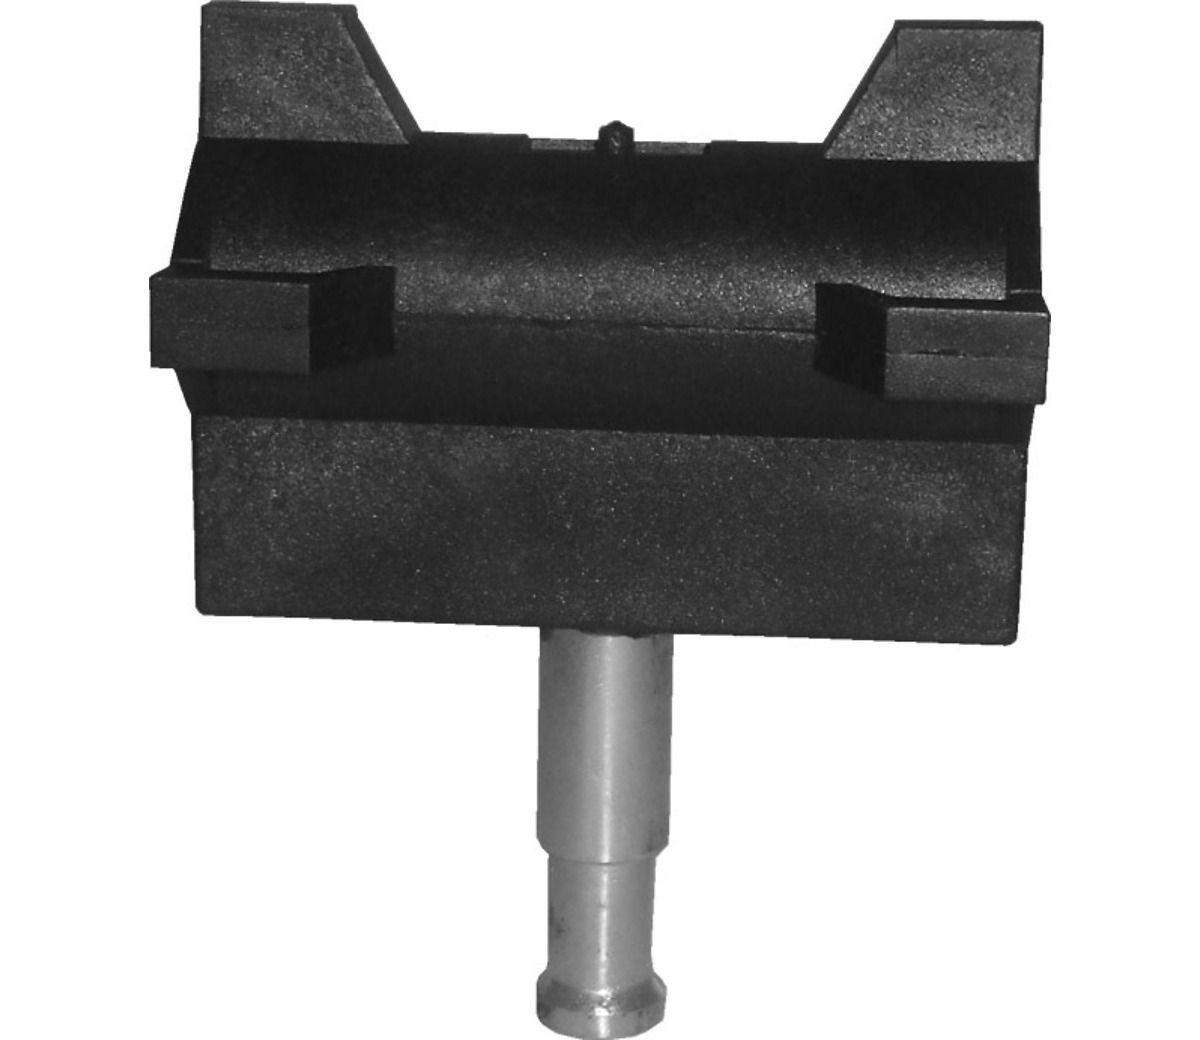 Porca do Fuso p/ Automatizador Basculante RCG